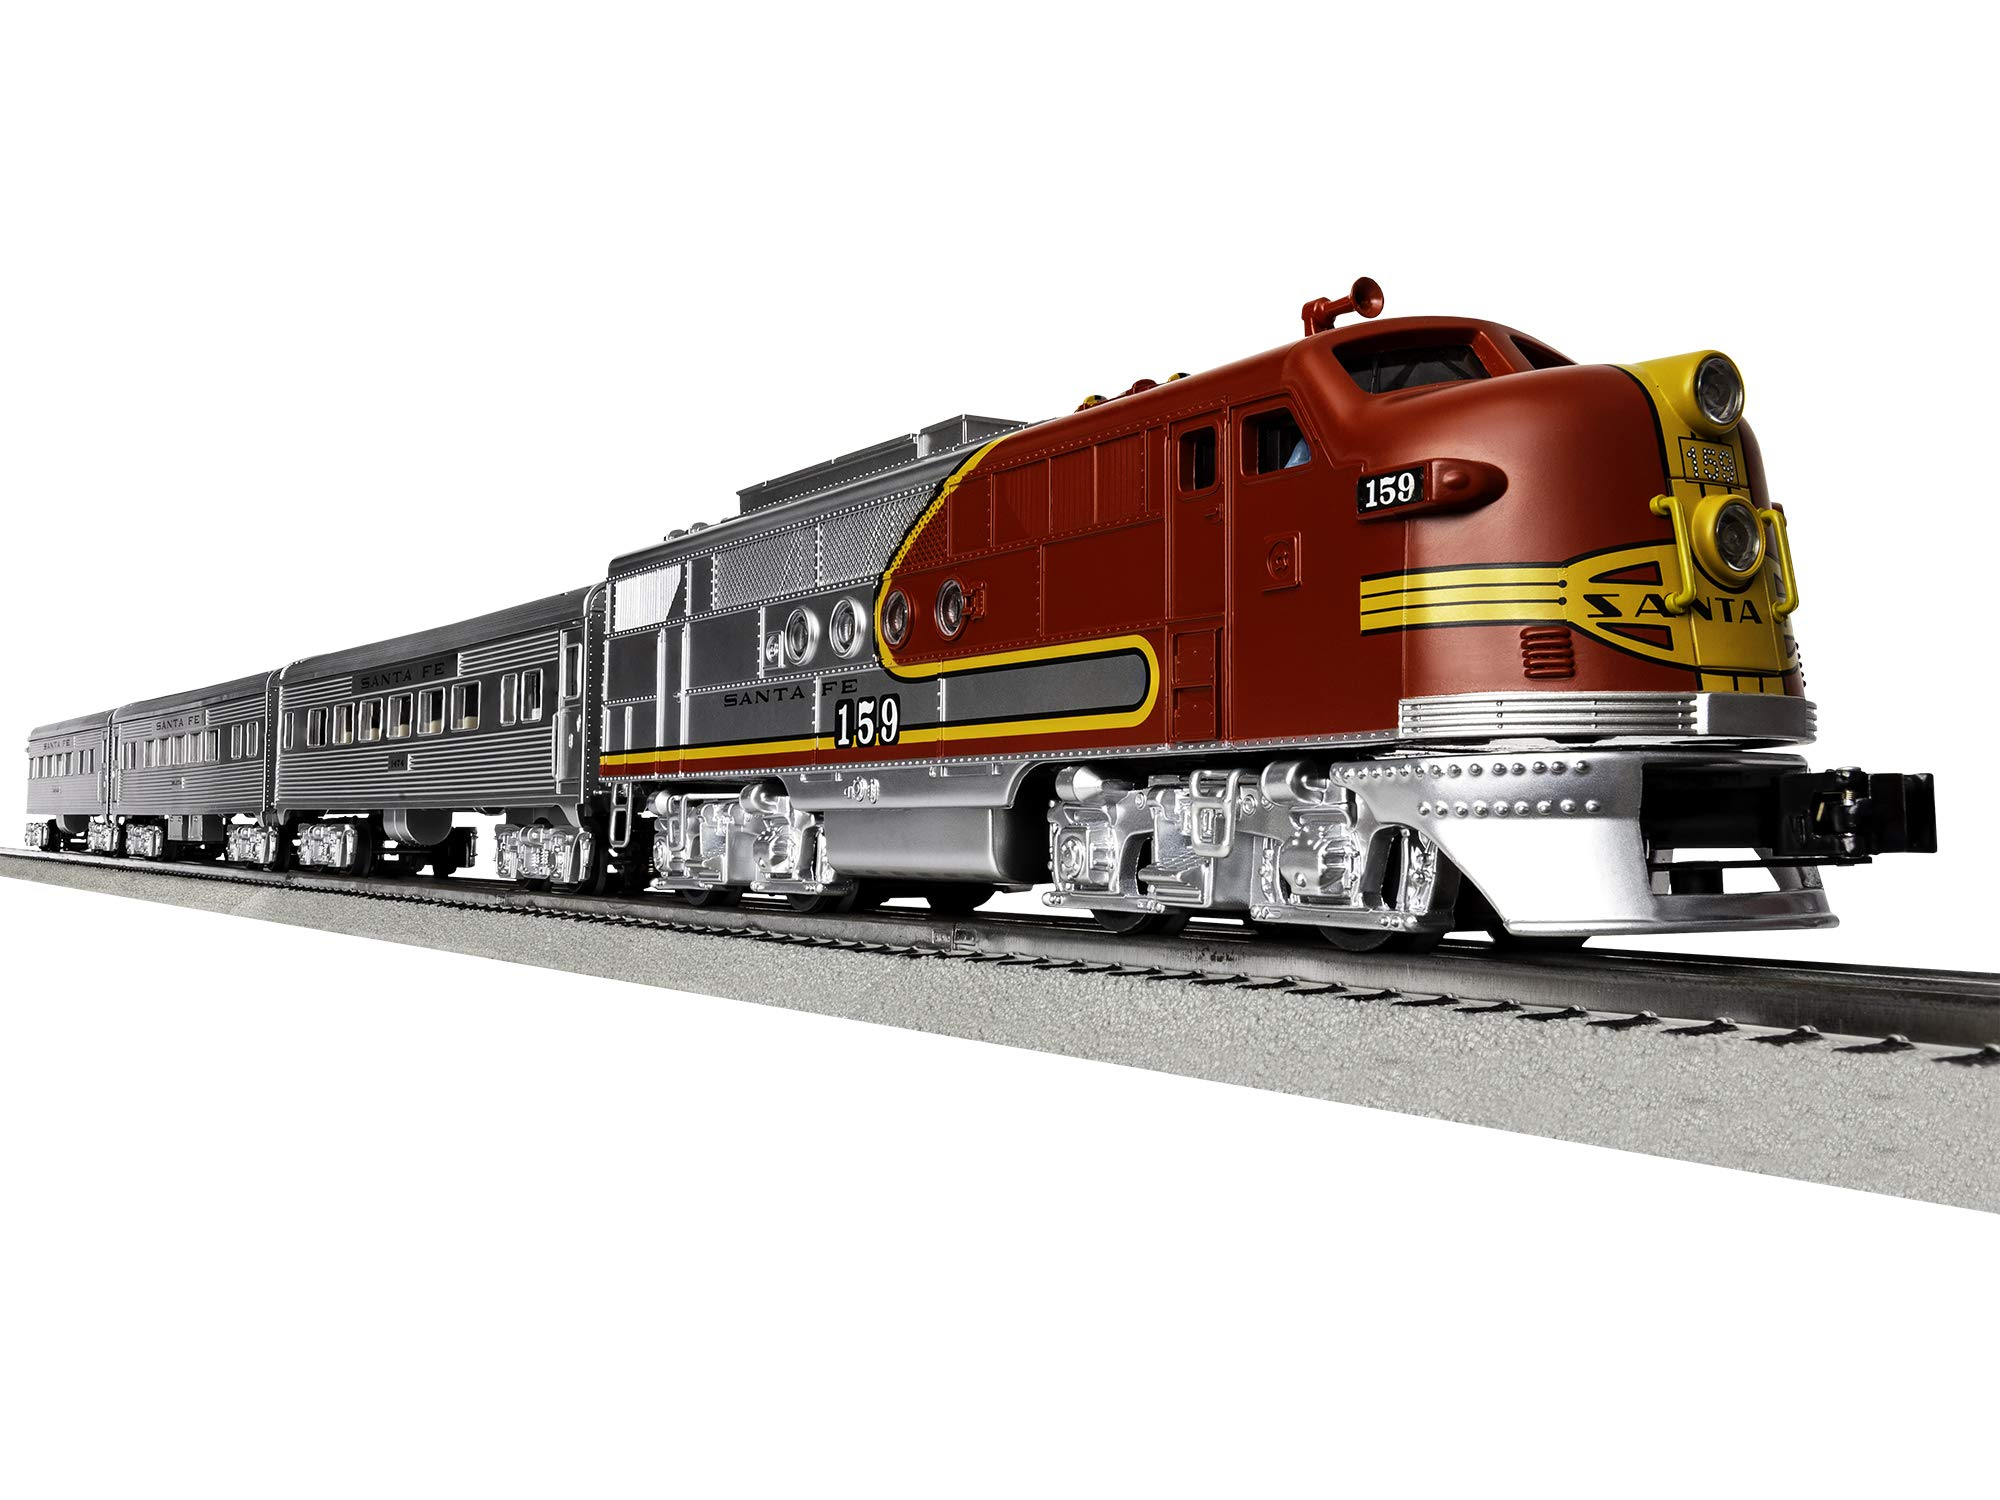 Lionel Santa Fe Super Chief Electric O Gauge Model Train Set w/ Remote and Bluetooth Capability by Lionel (Image #1)